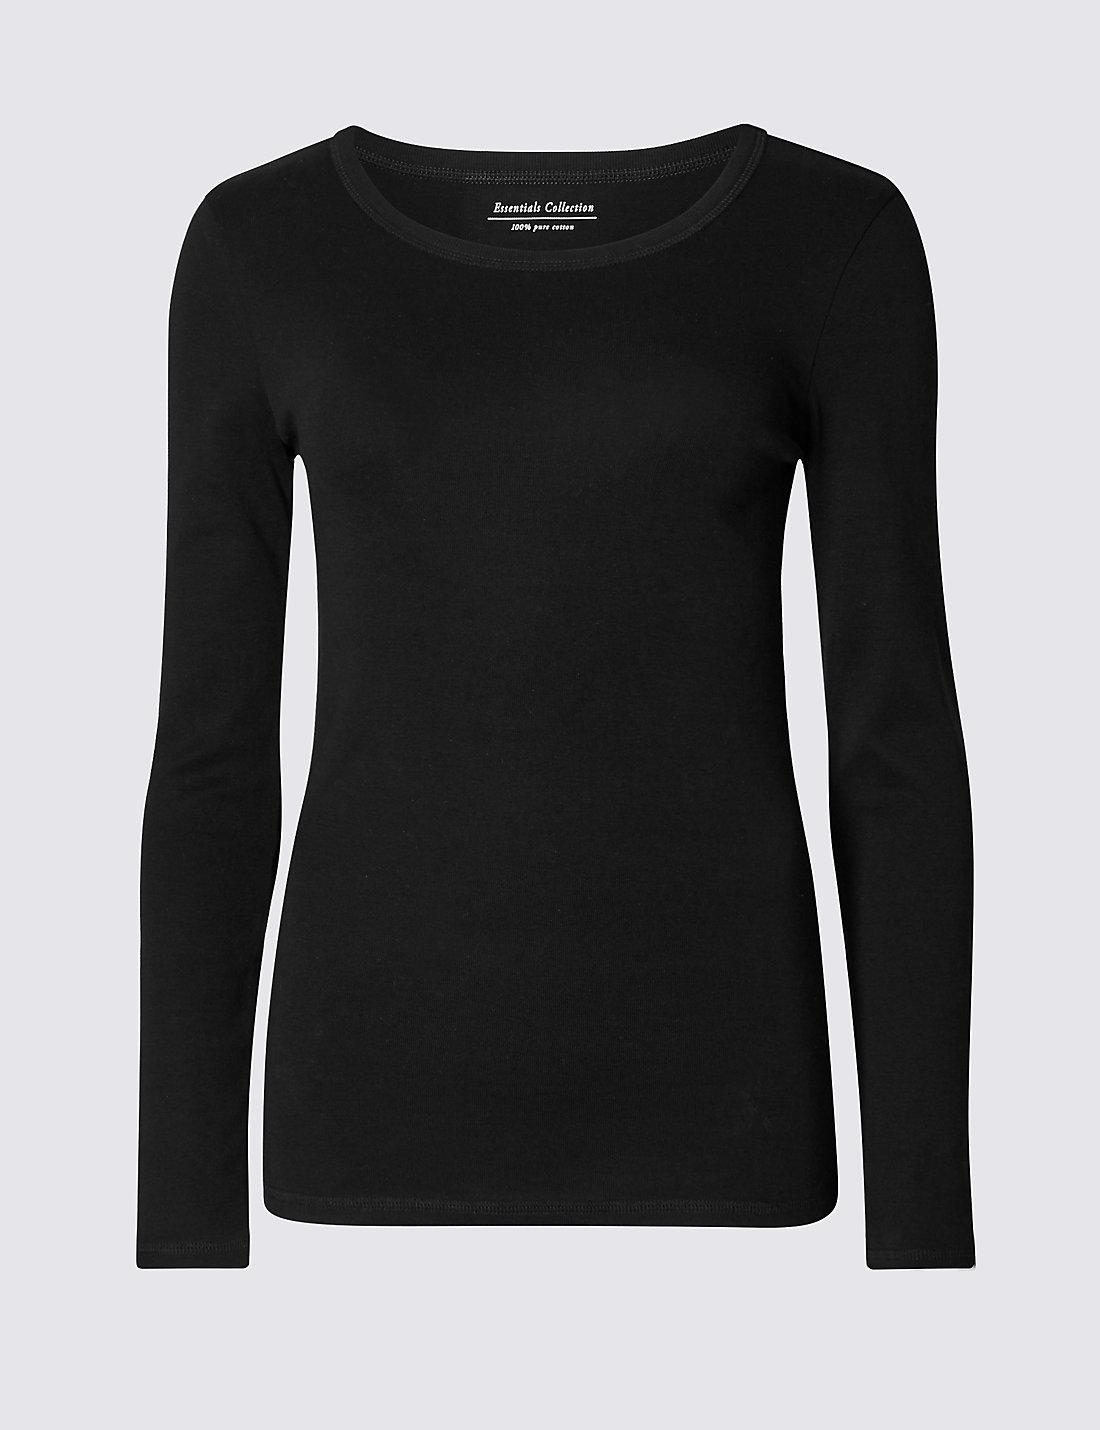 Black t shirt long sleeve - Pure Cotton Round Neck Long Sleeve T Shirt